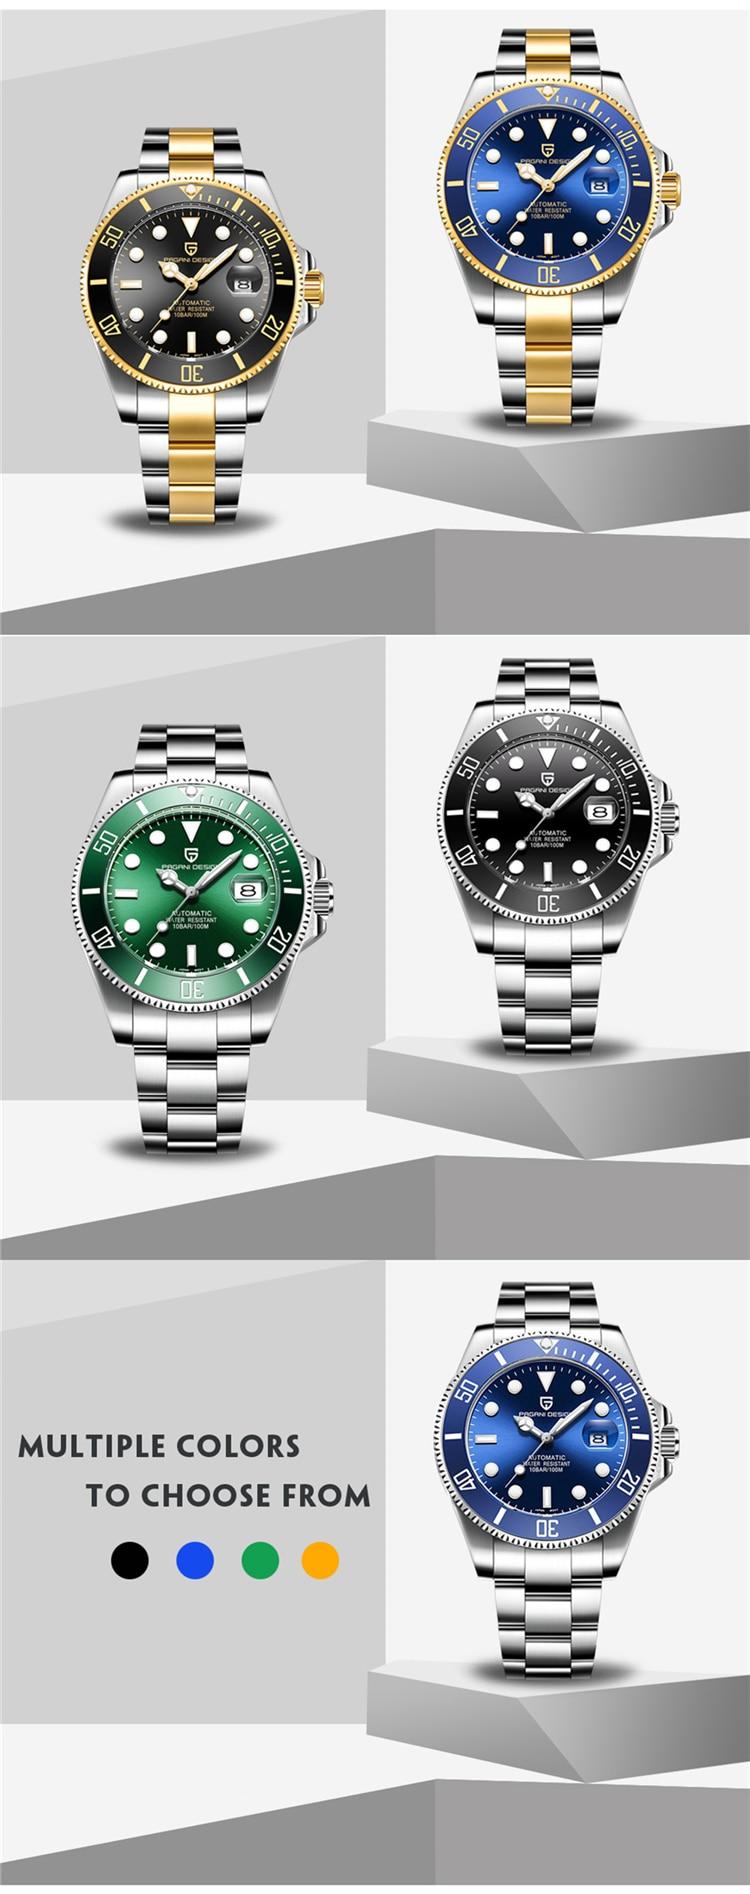 Hfc1c57c069e64afbbd474da7ee2f28ecf PAGANI Design Brand Luxury Men Watches Automatic Black Watch Men Stainless Steel Waterproof Business Sport Mechanical Wristwatch